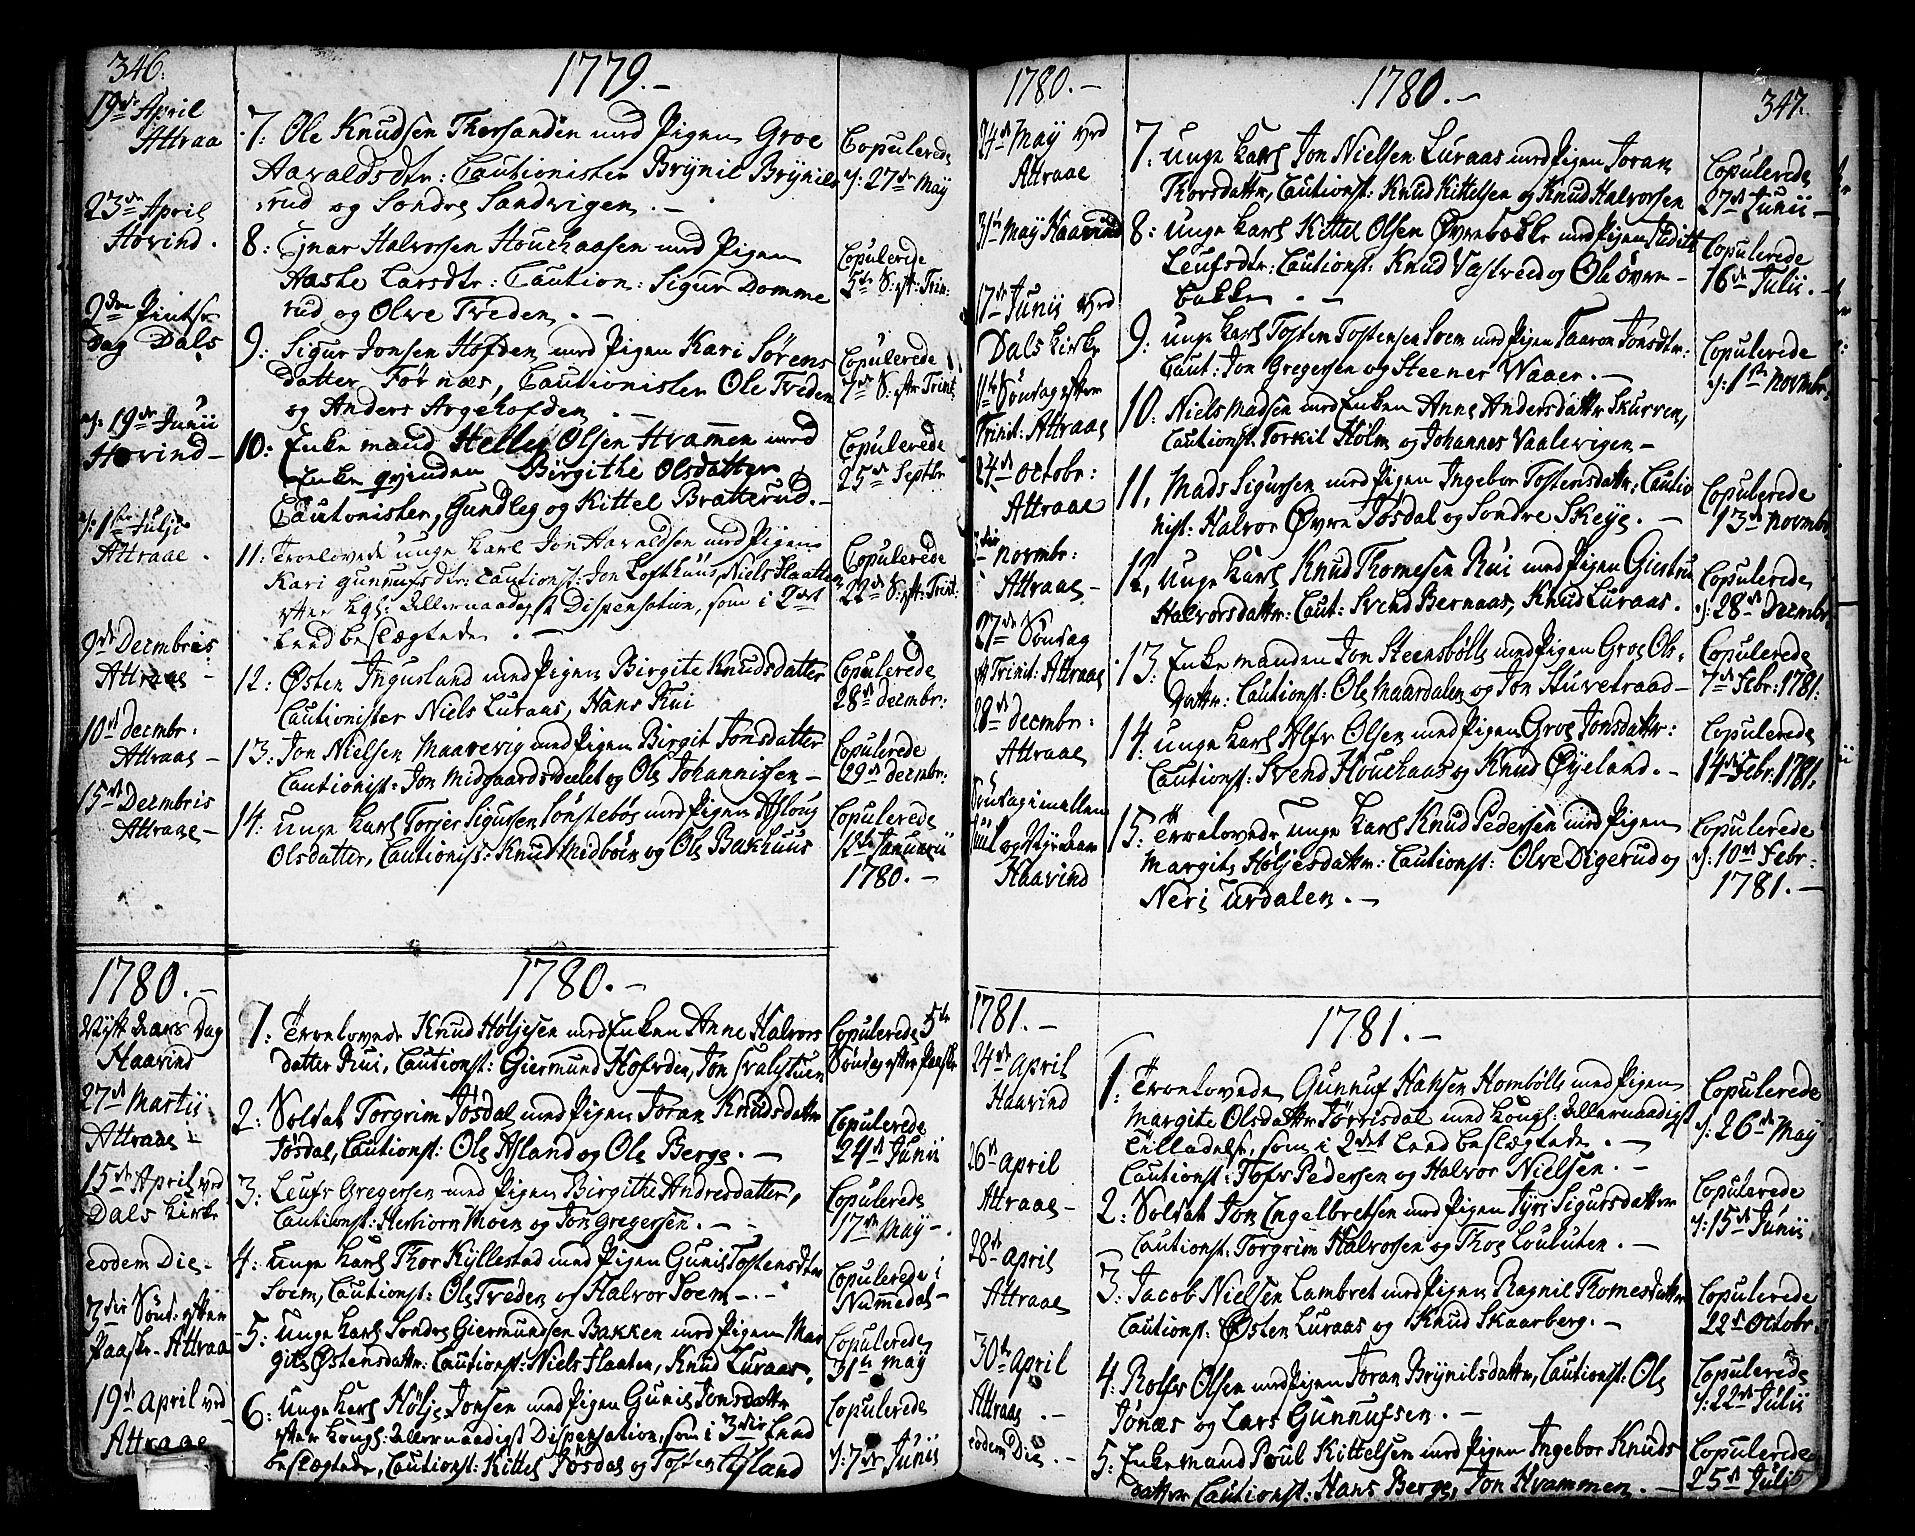 SAKO, Tinn kirkebøker, F/Fa/L0002: Ministerialbok nr. I 2, 1757-1810, s. 346-347